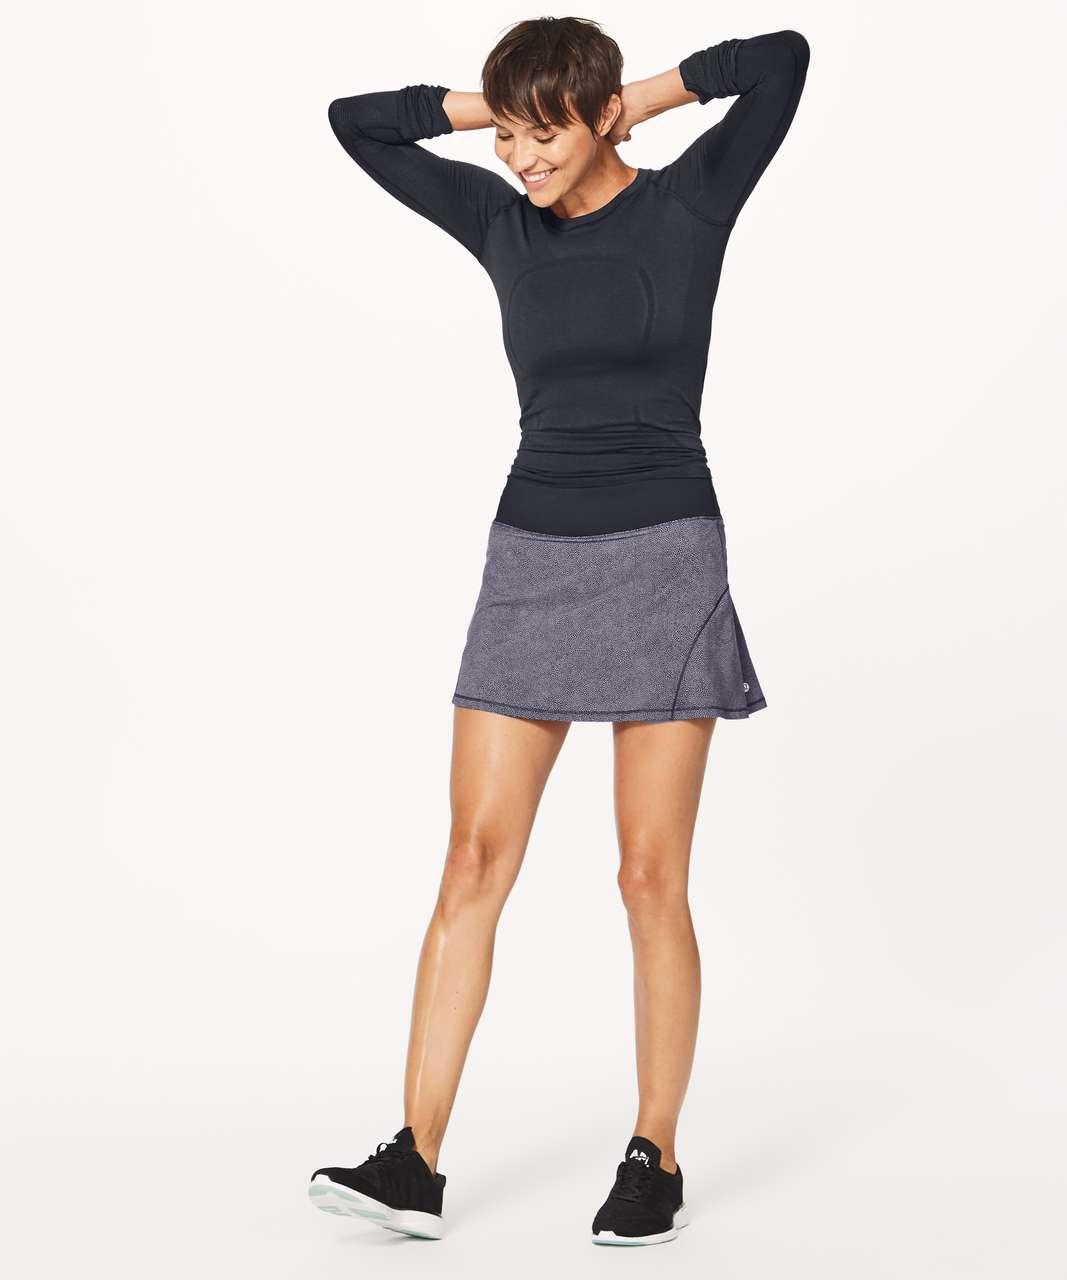 "Lululemon Circuit Breaker Skirt II (Tall) (15"") - Disperse Dusky Lavender Black / Black"